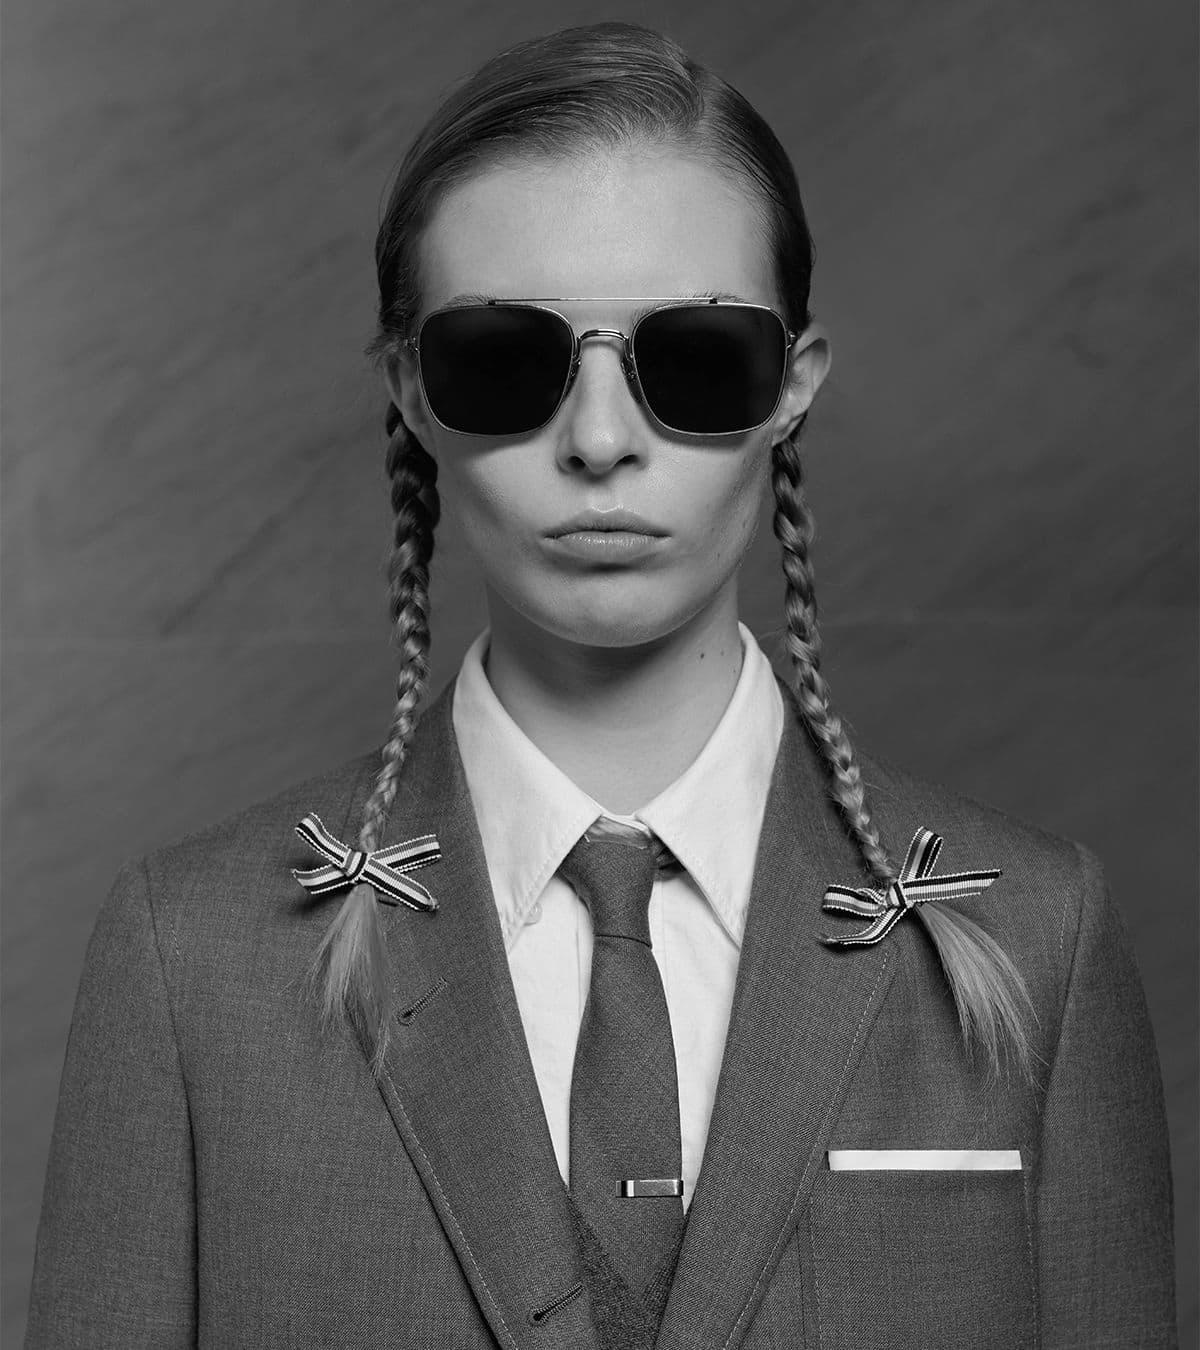 Thom Browne Eyewear 2021 Ad Campaign Photos